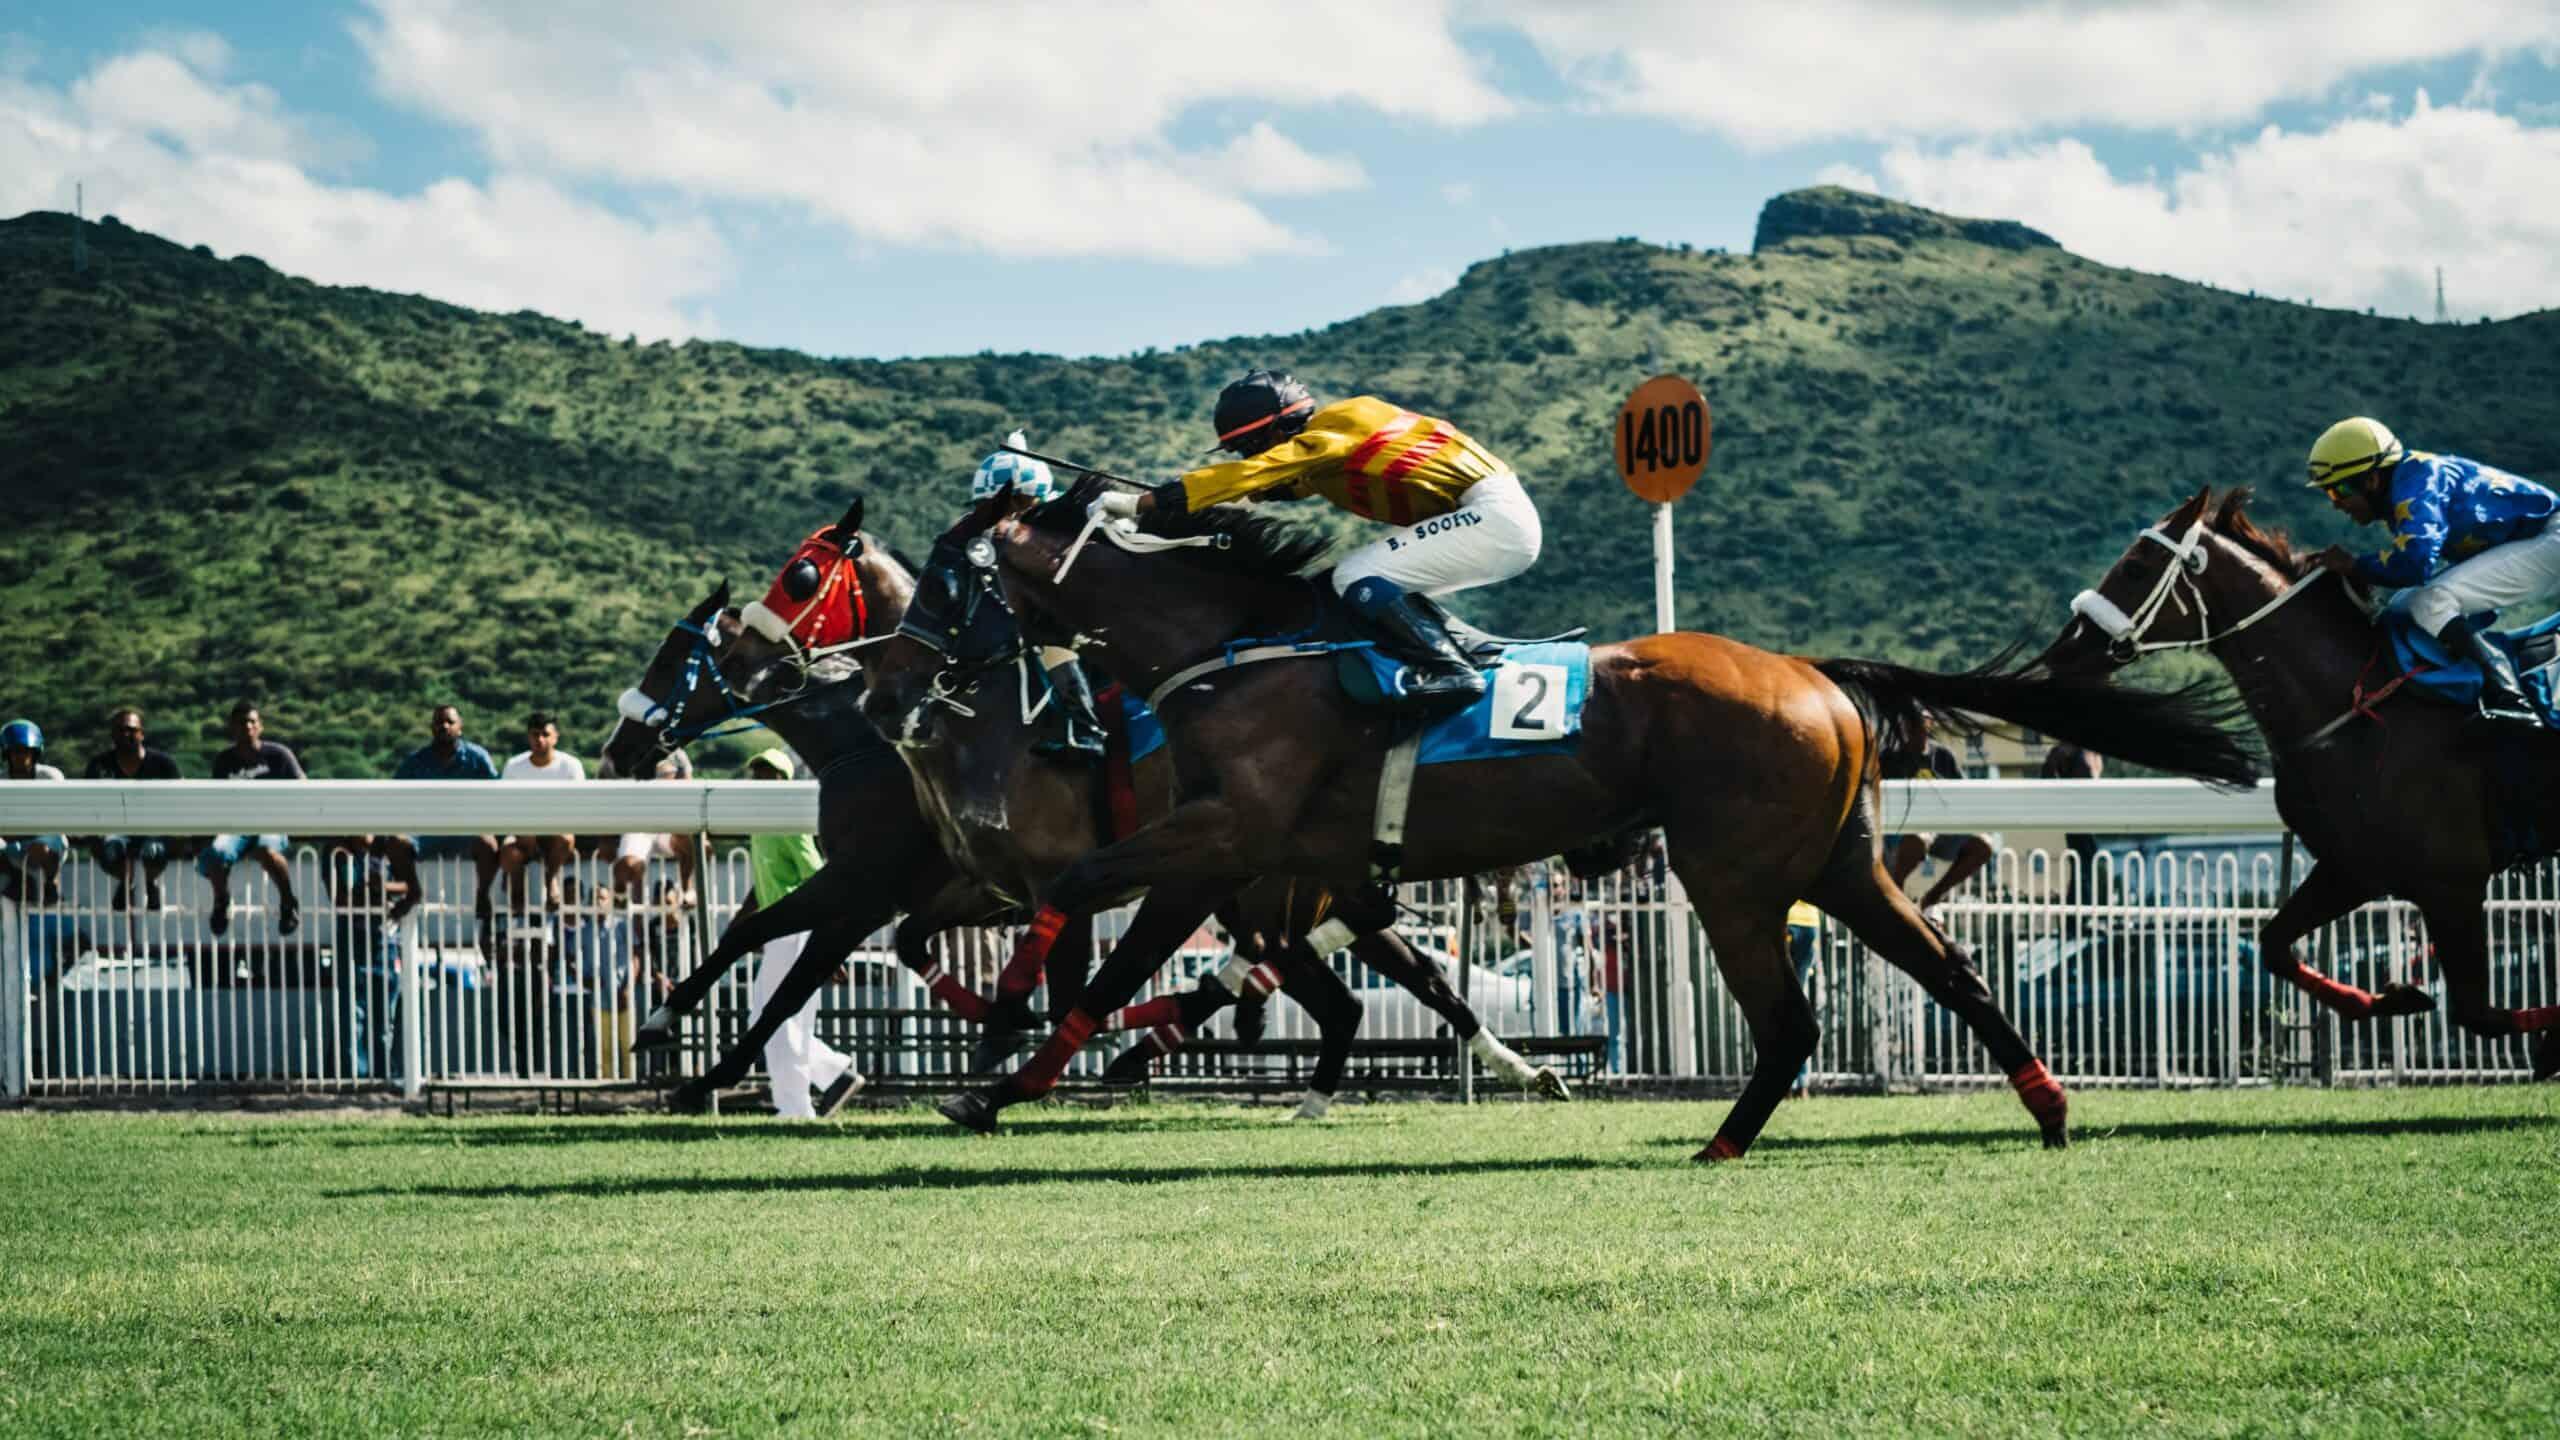 Digital Marketing For Racecoures